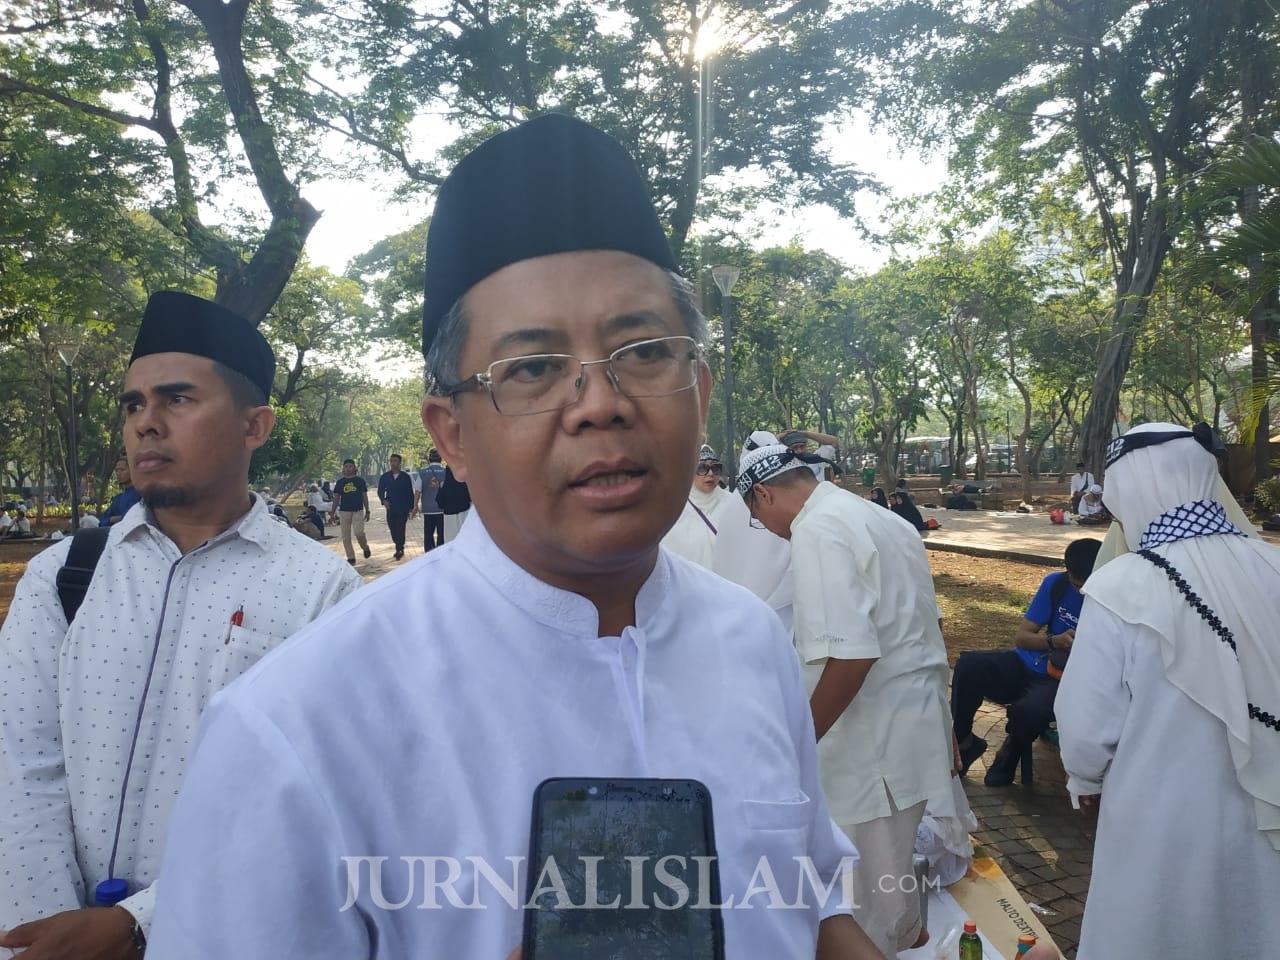 Presiden PKS di Reuni 212: Kami Bagian dari Umat dan Bangsa